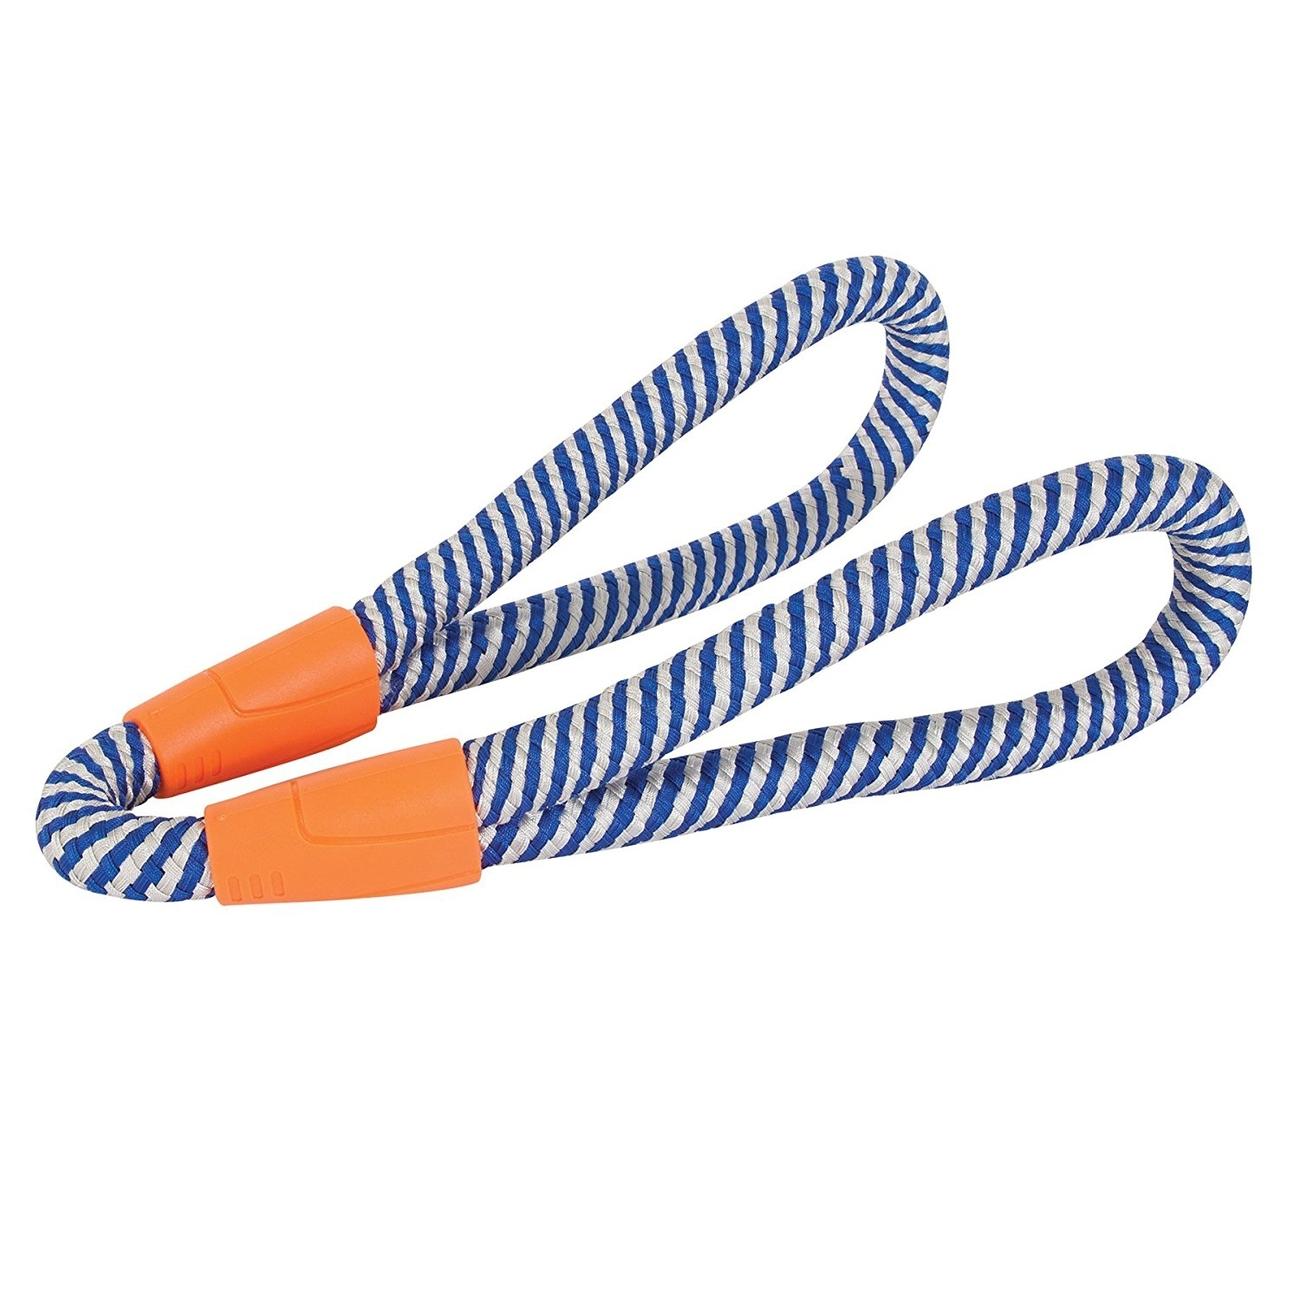 Chuckit! Mountain Rope Tug Zerrspielzeug für Hunde, Bild 3